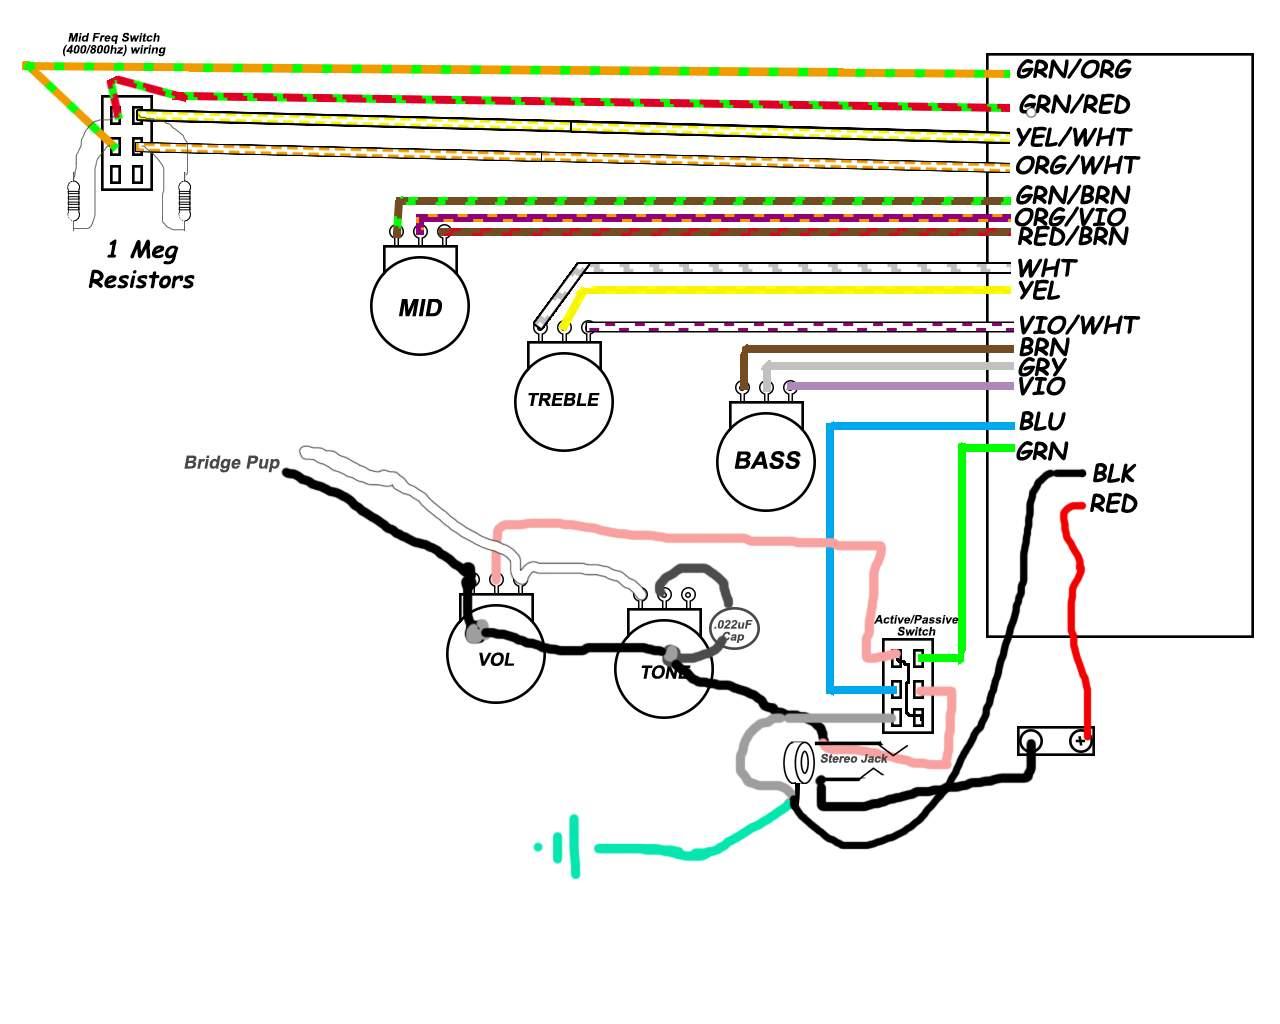 Eq Wiring Diagram List Of Schematic Circuit Opel Kadett Gsi Preamp Auto Electrical Rh Bitoku Me 6500 Pioneer